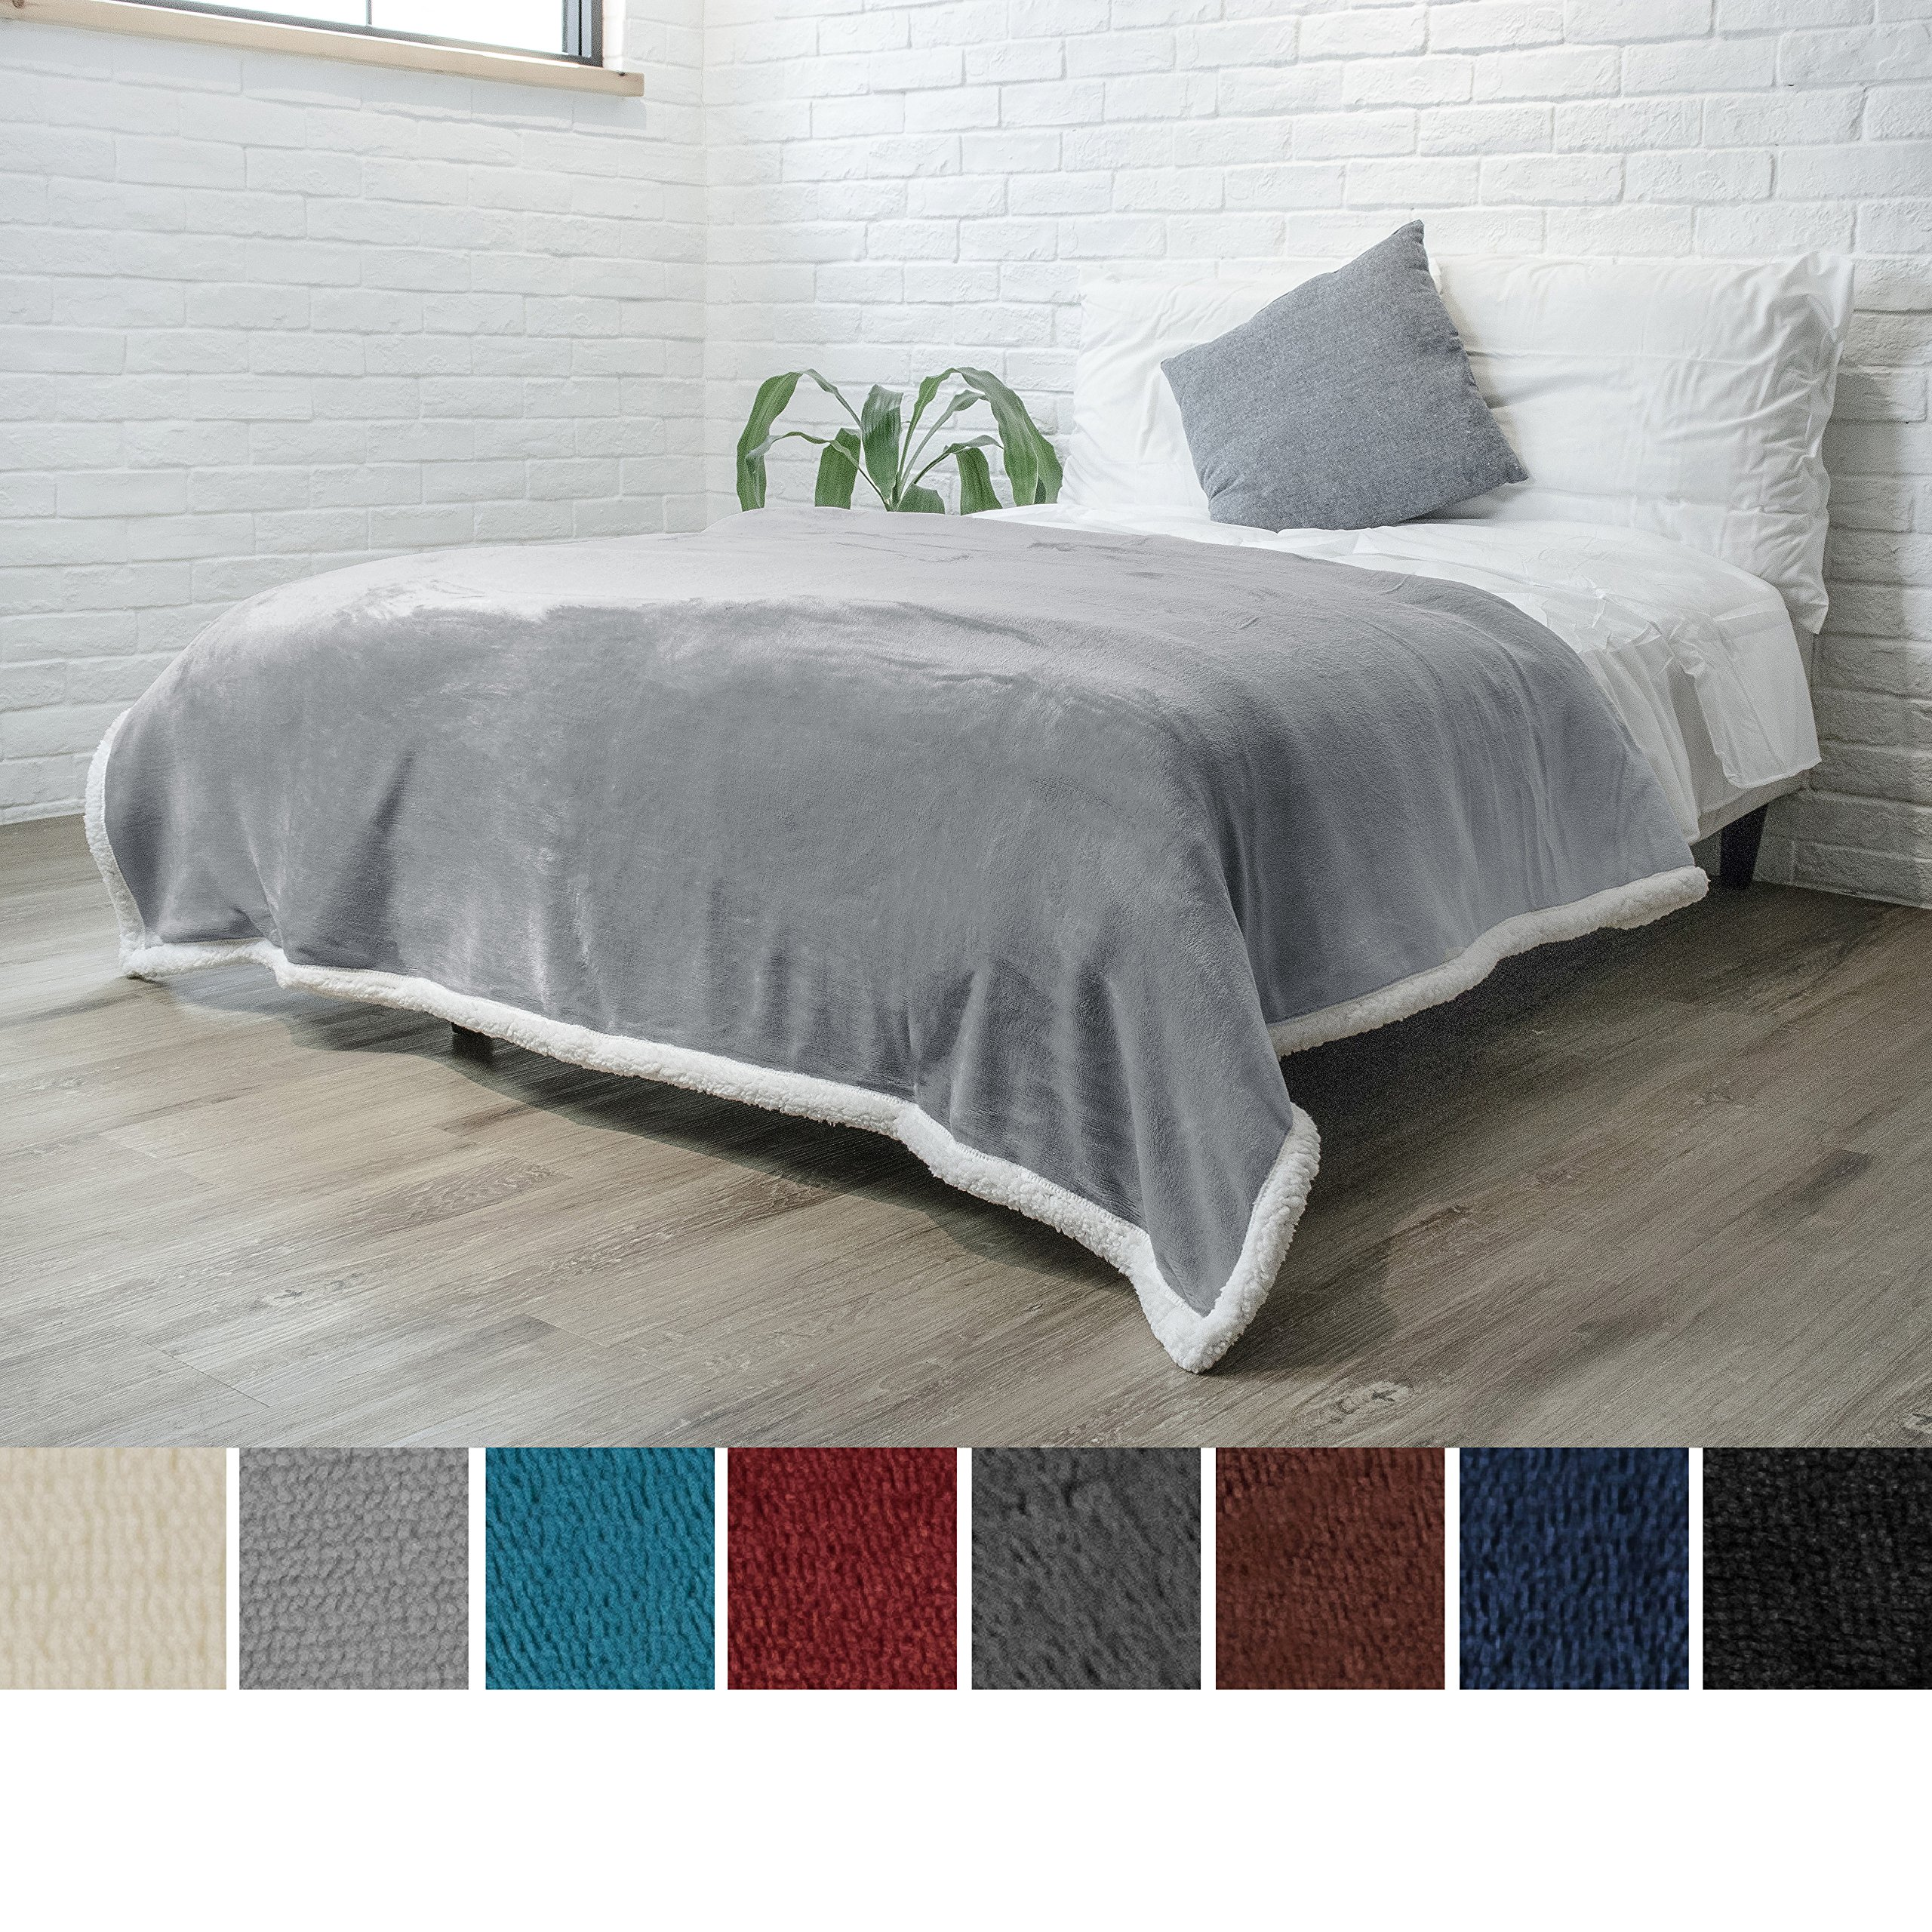 PAVILIA Premium Sherpa Twin Size Blanket | Flannel Fleece Twin Bed Blanket | Plush, Soft, Cozy, Warm, Lightweight Microfiber, Reversible, All Season Use (Light Grey, 60 x 80 inches)